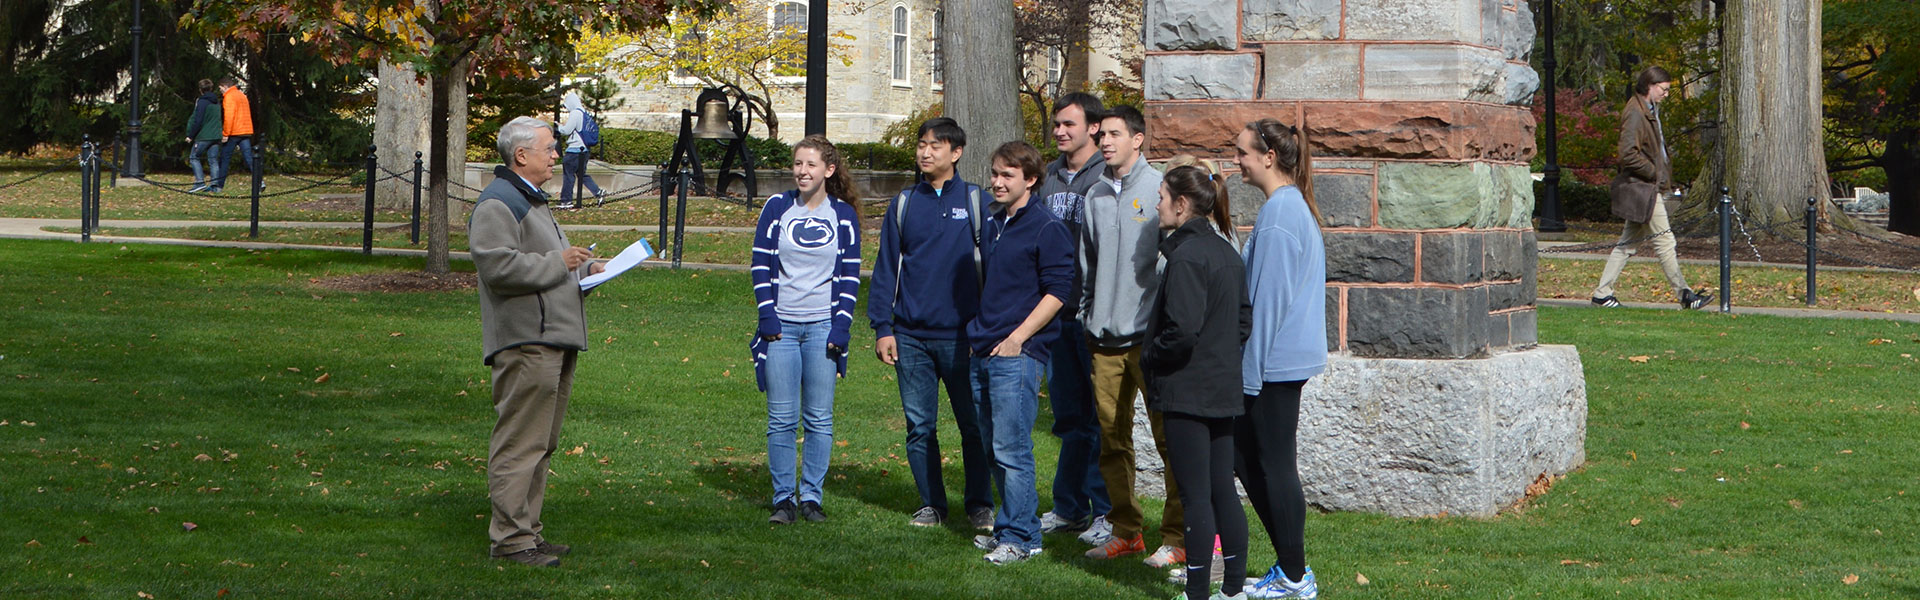 Students by Obelisk